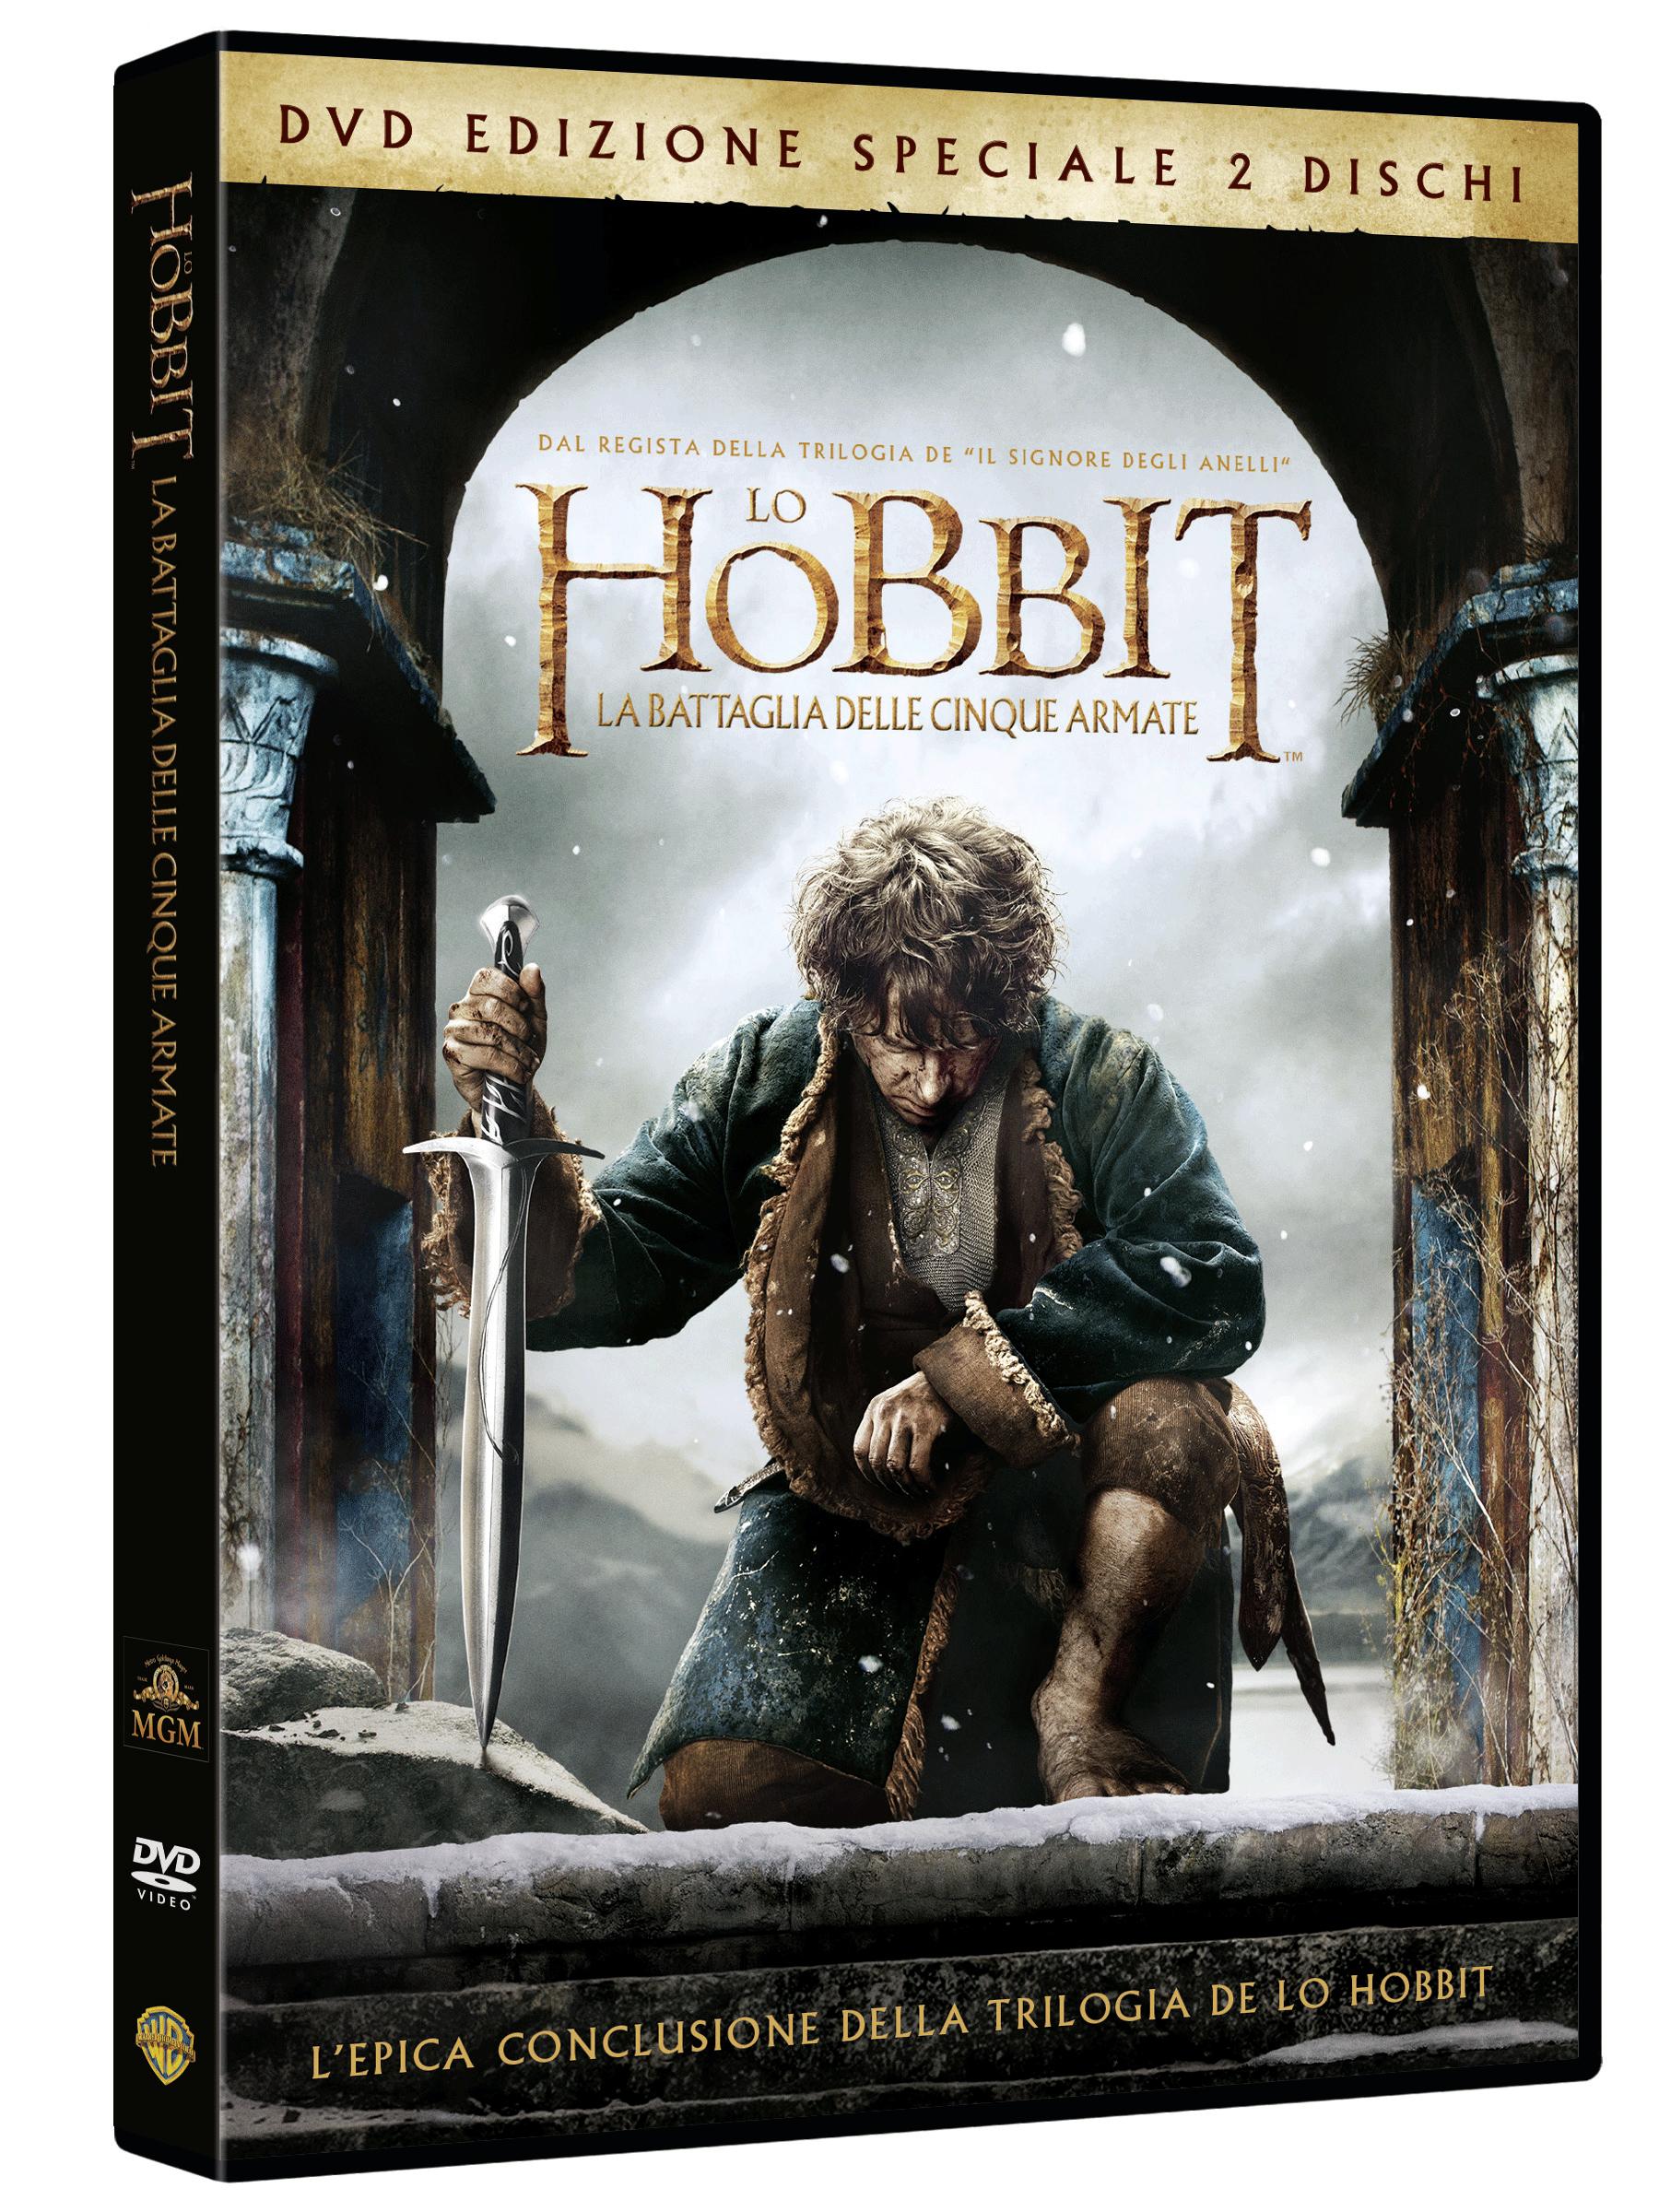 hobbit battaglia cinque armate dvd